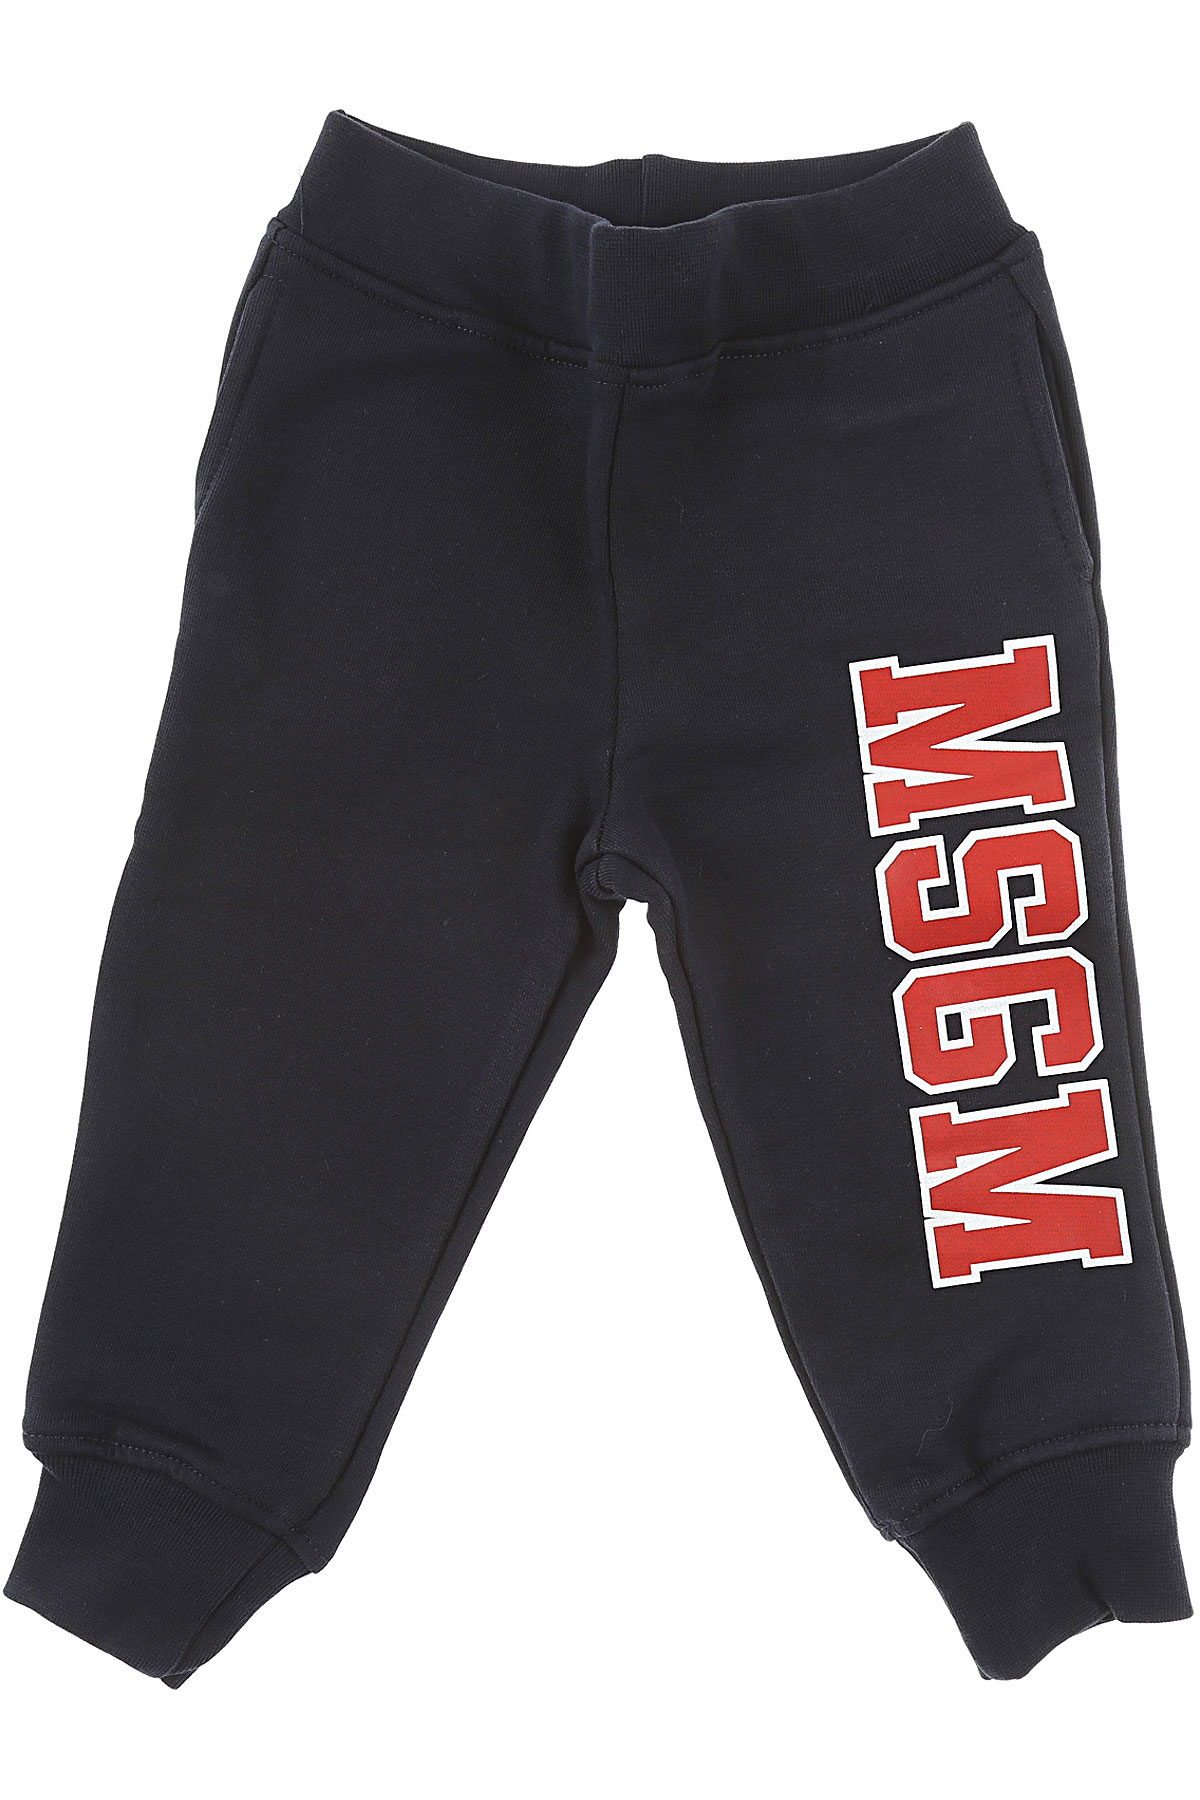 Image of MSGM Baby Sweatpants for Boys, Black, Cotton, 2017, 12M 18M 2Y 6M 9M